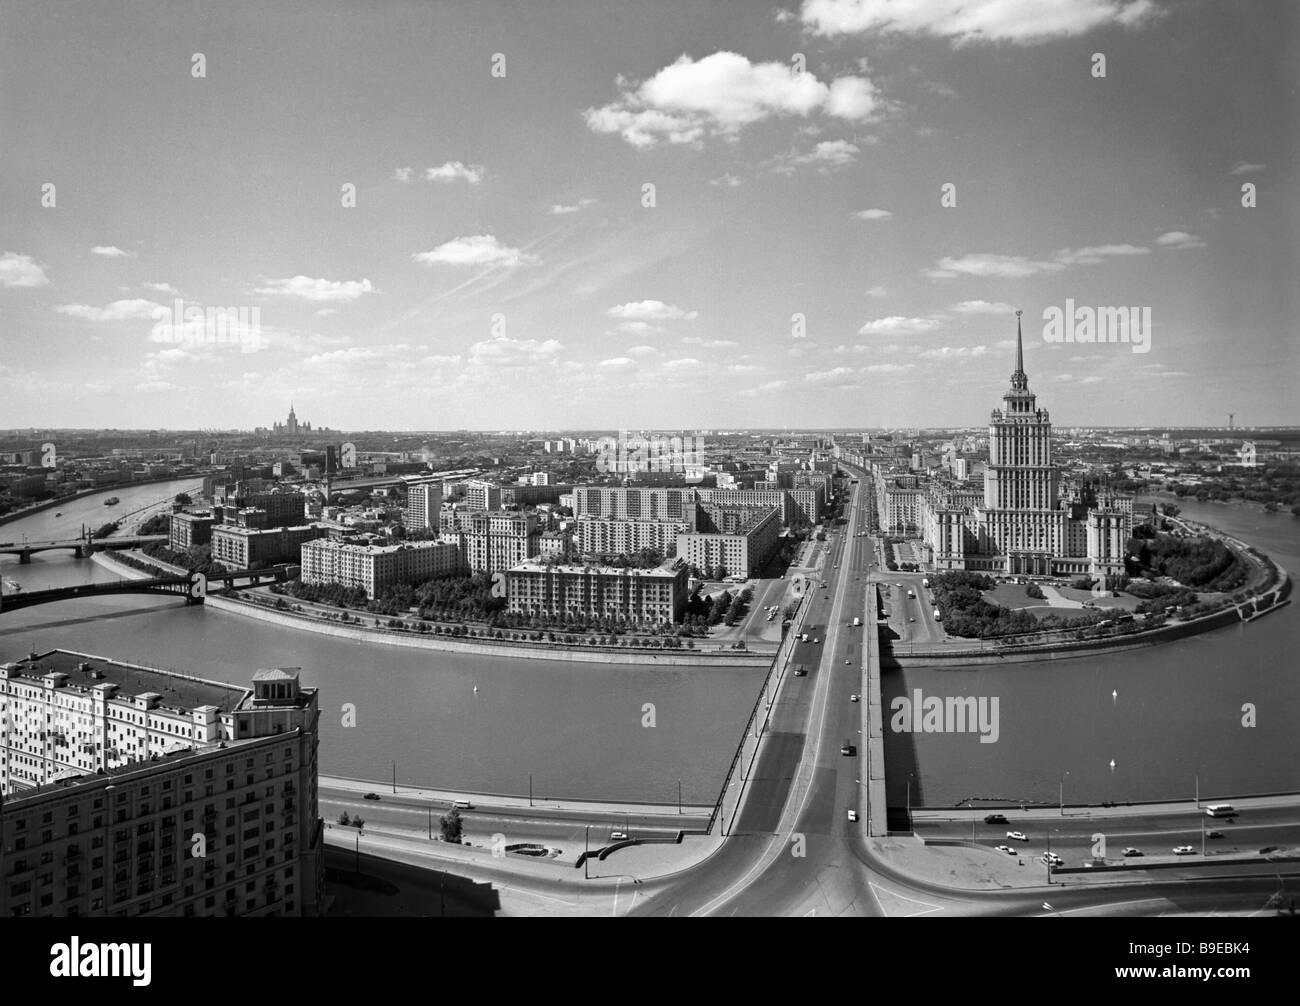 View of the Moskva River and the Kutuzov Prospekt - Stock Image